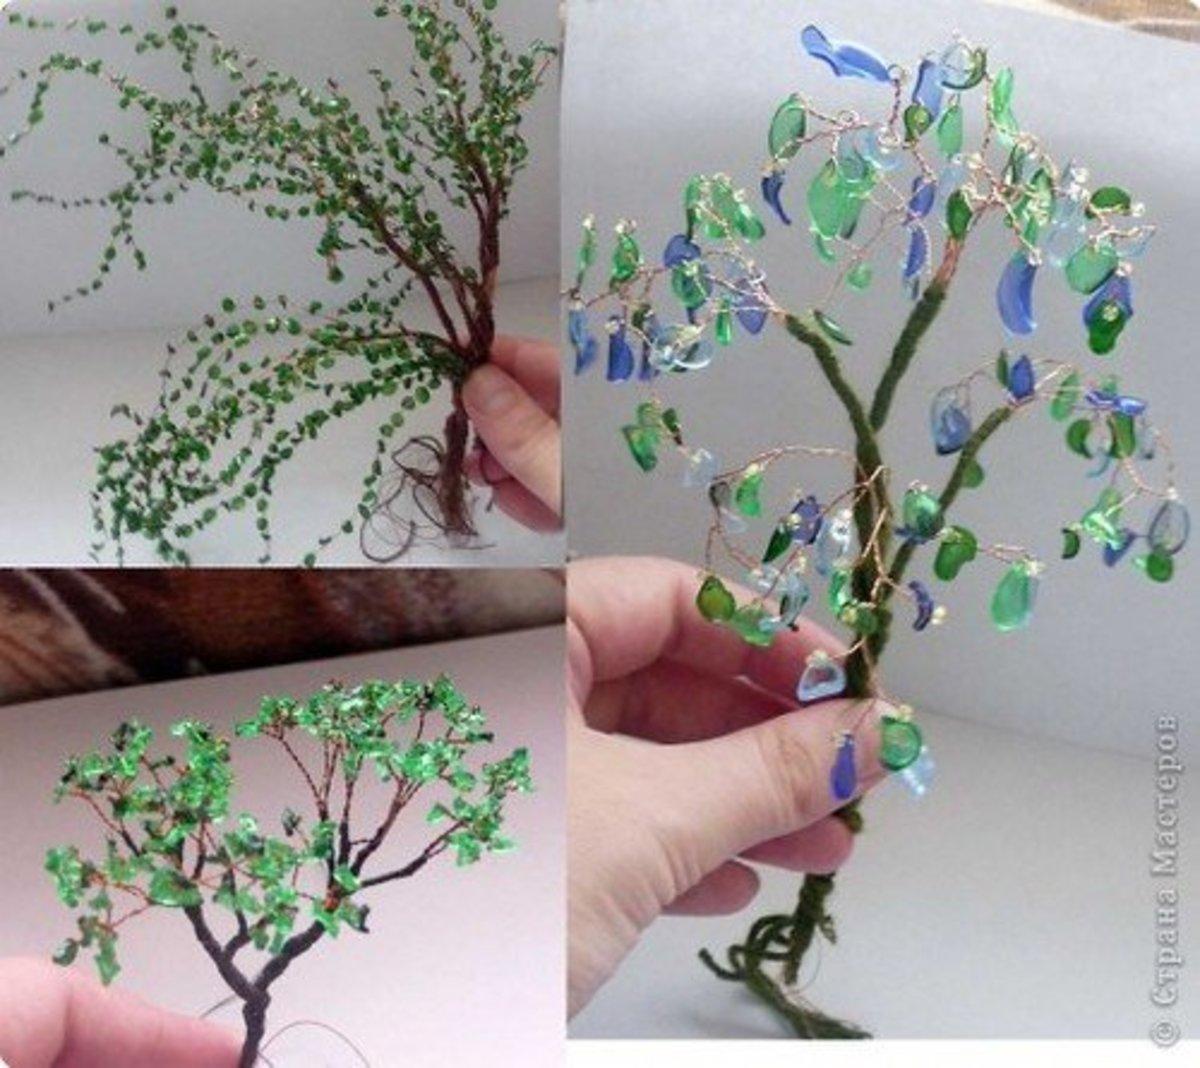 75 Inspiring Craft Ideas Using Plastic Bottles Feltmagnet Crafts